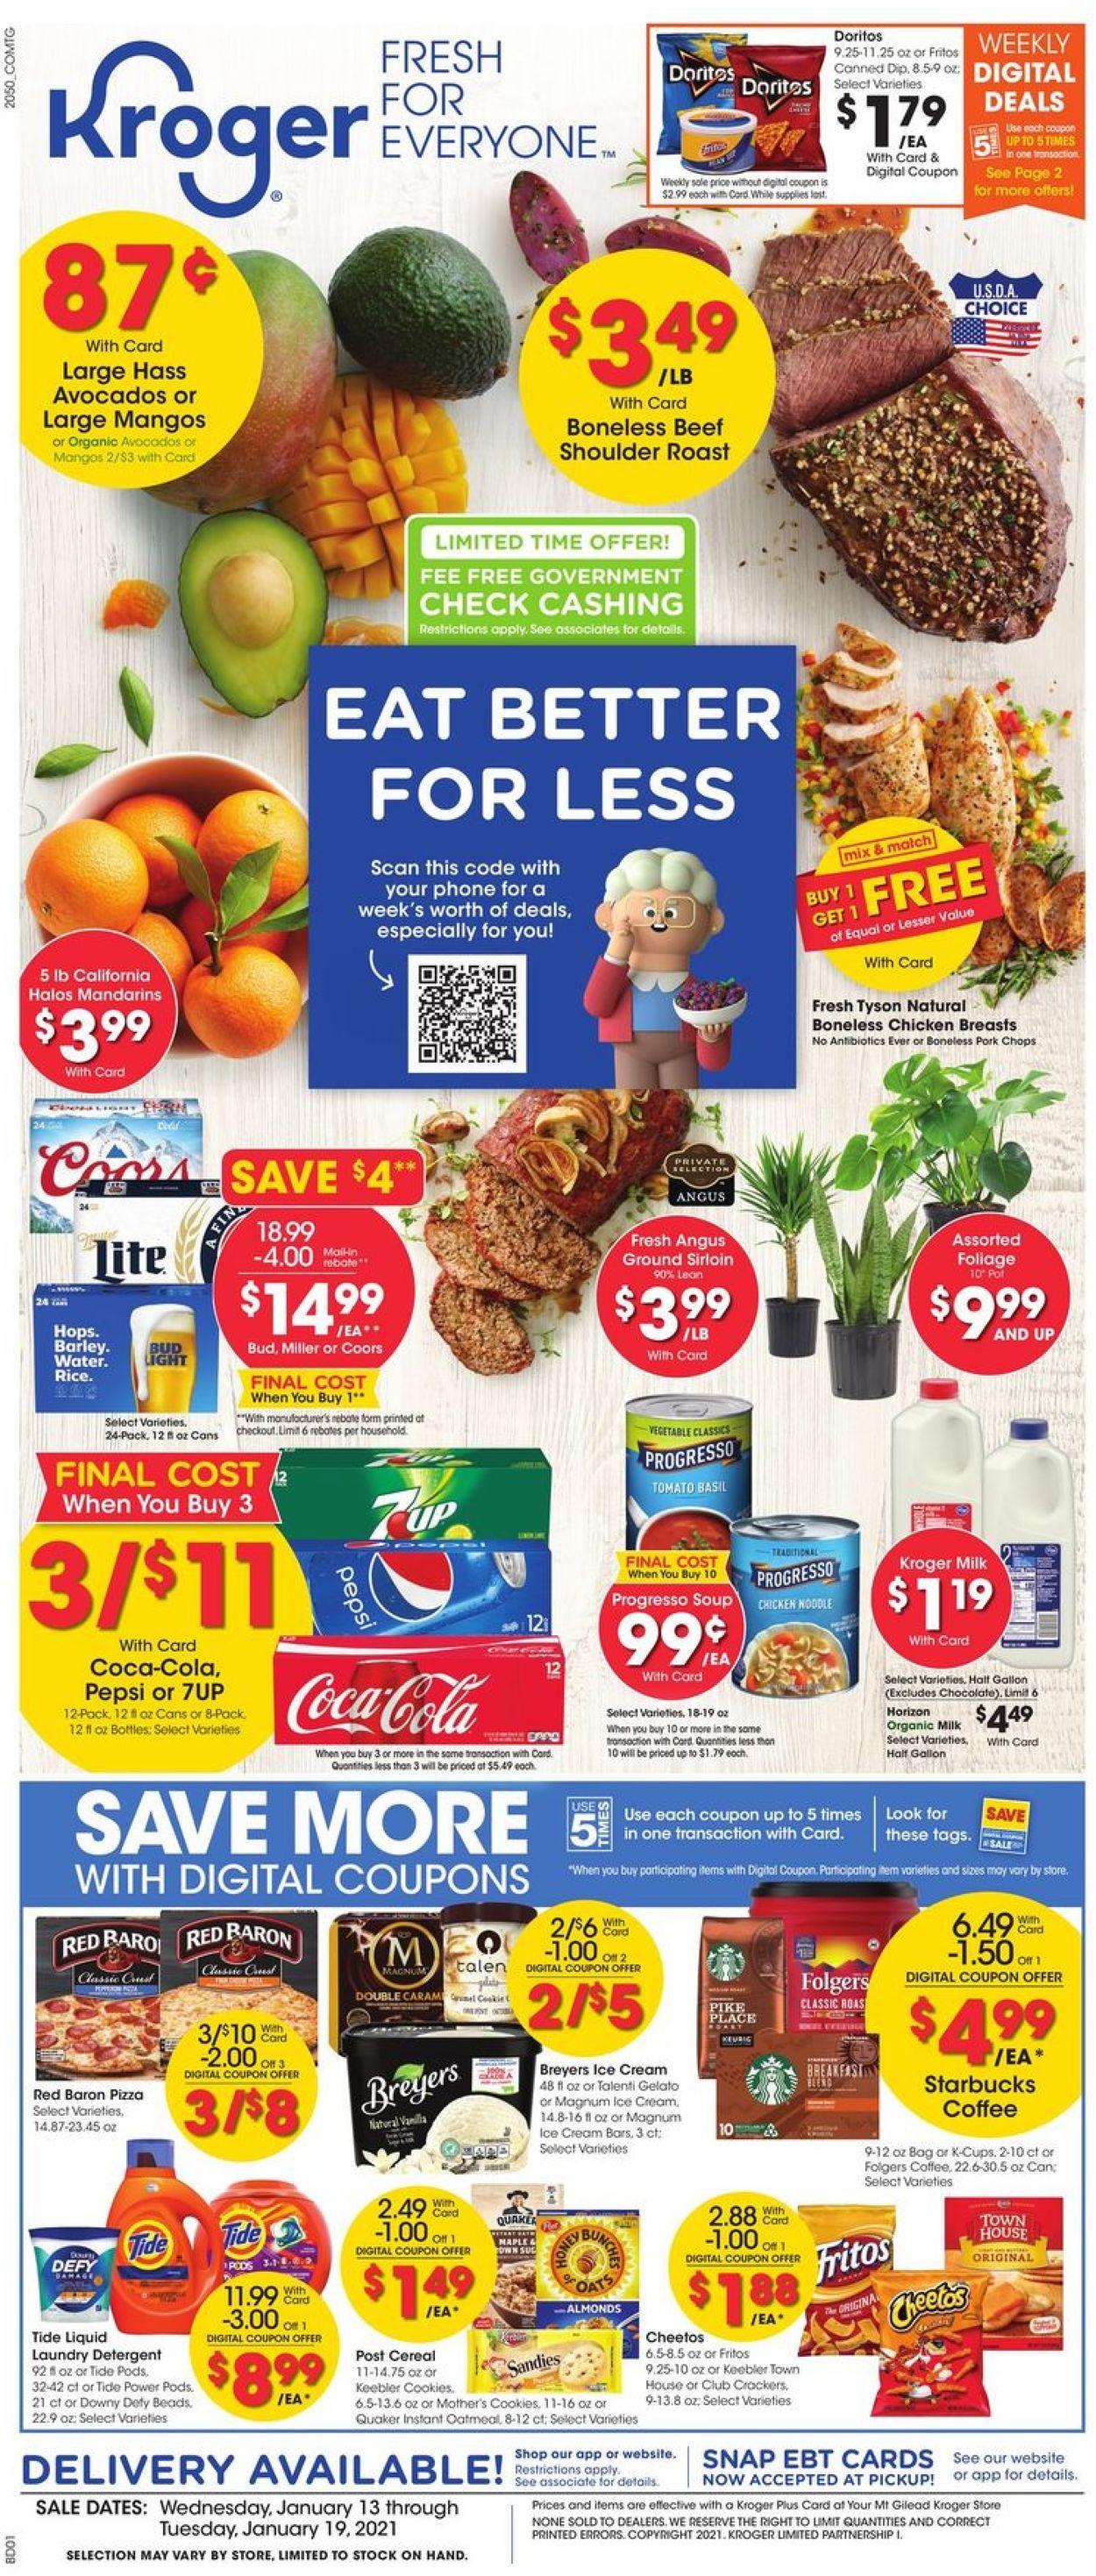 Kroger Weekly Ad Circular - valid 01/13-01/19/2021